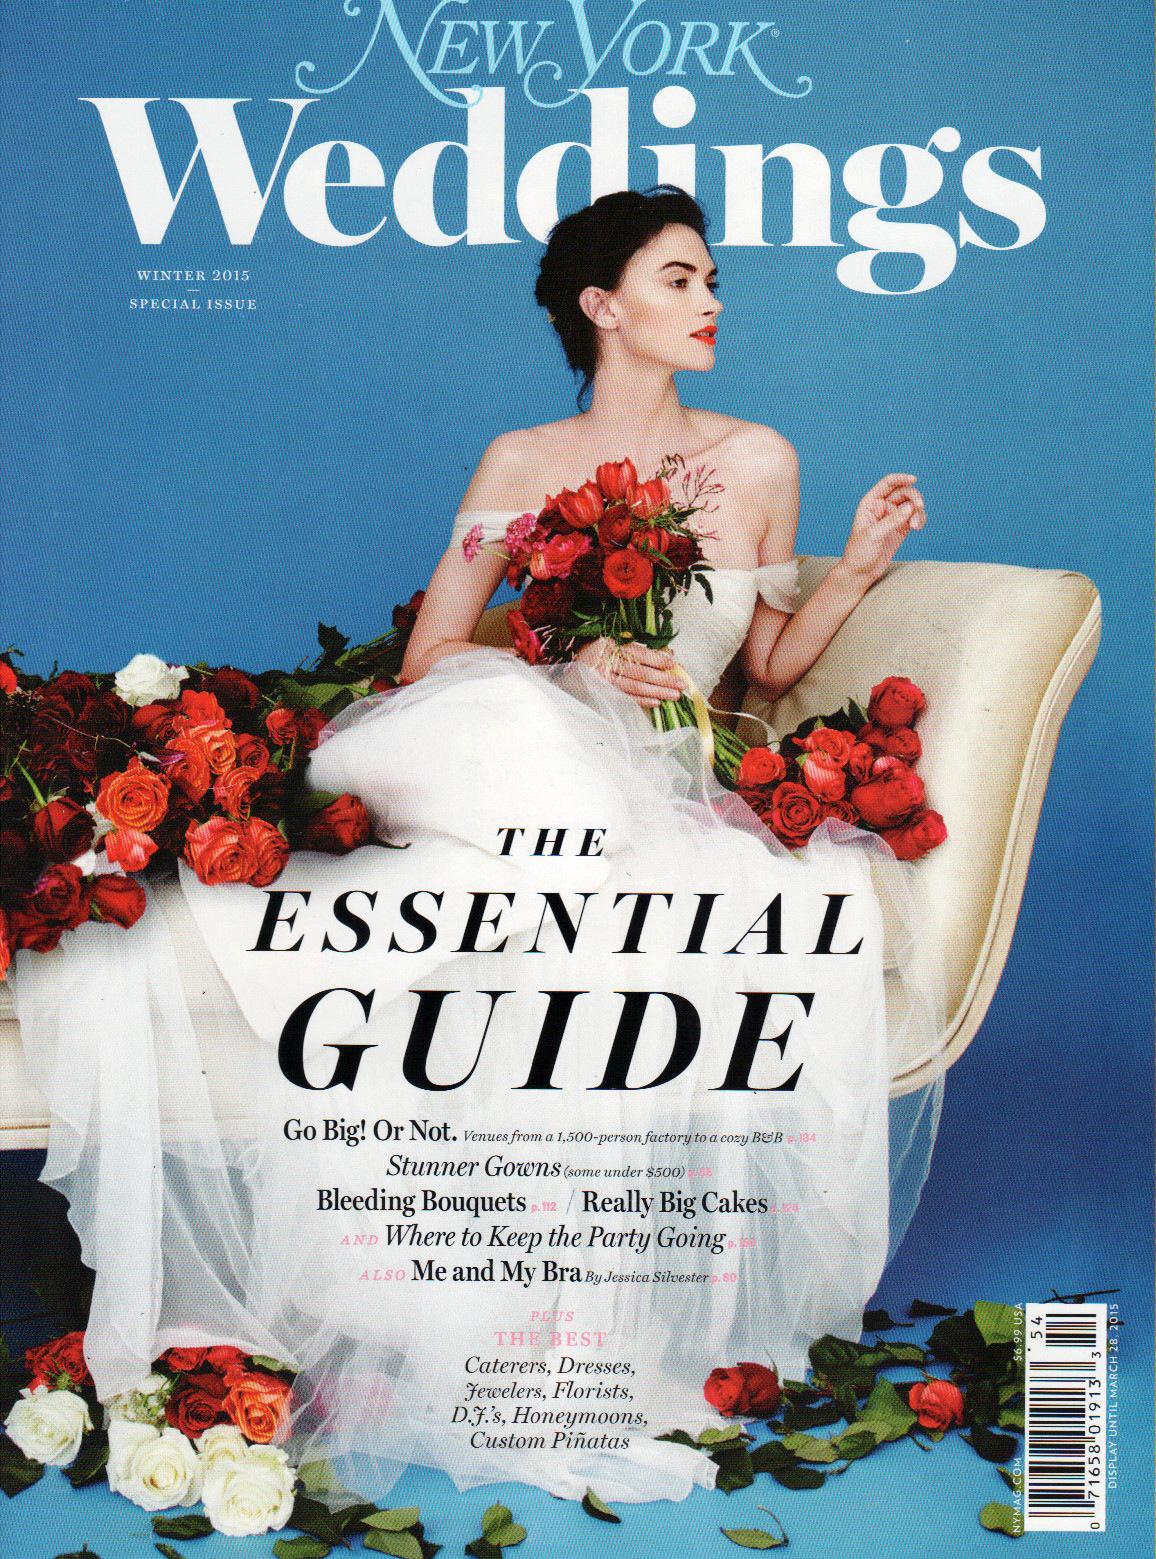 New York Weddings Winter 2015